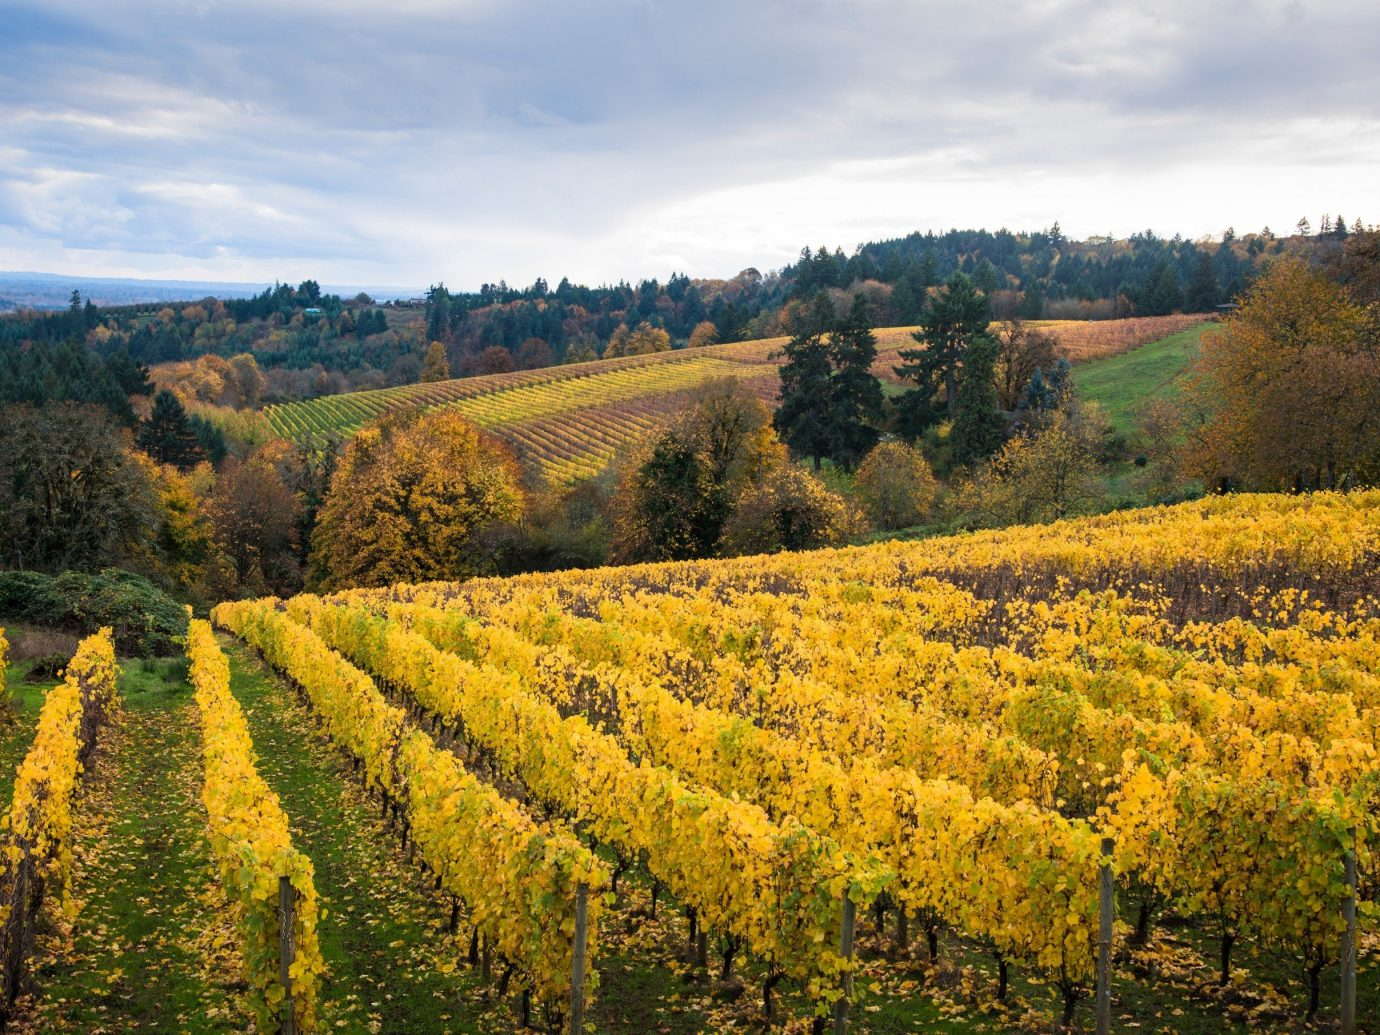 Vineyard in Willamette Valley, Oregon